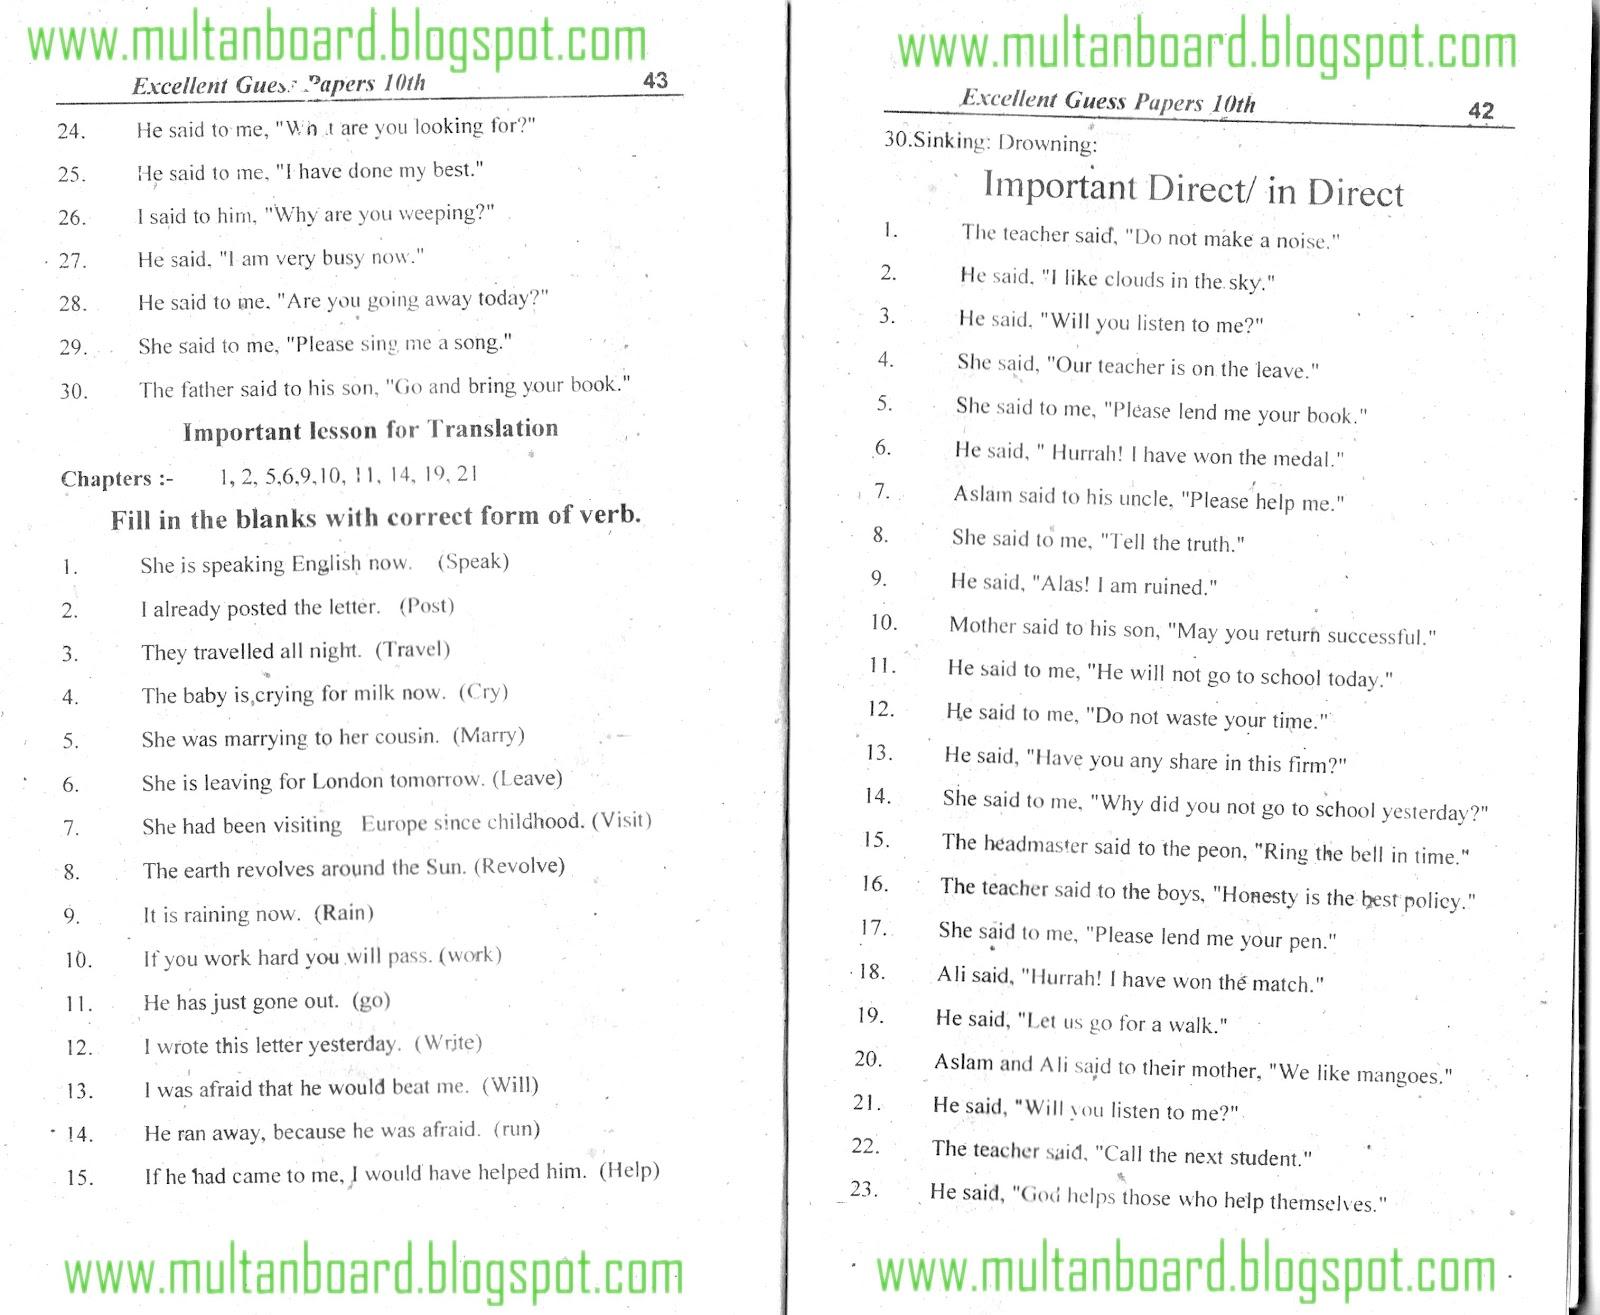 014 Eng Jpg Essay Example The Breakfast Breathtaking Club Scene Introduction Analysis Full